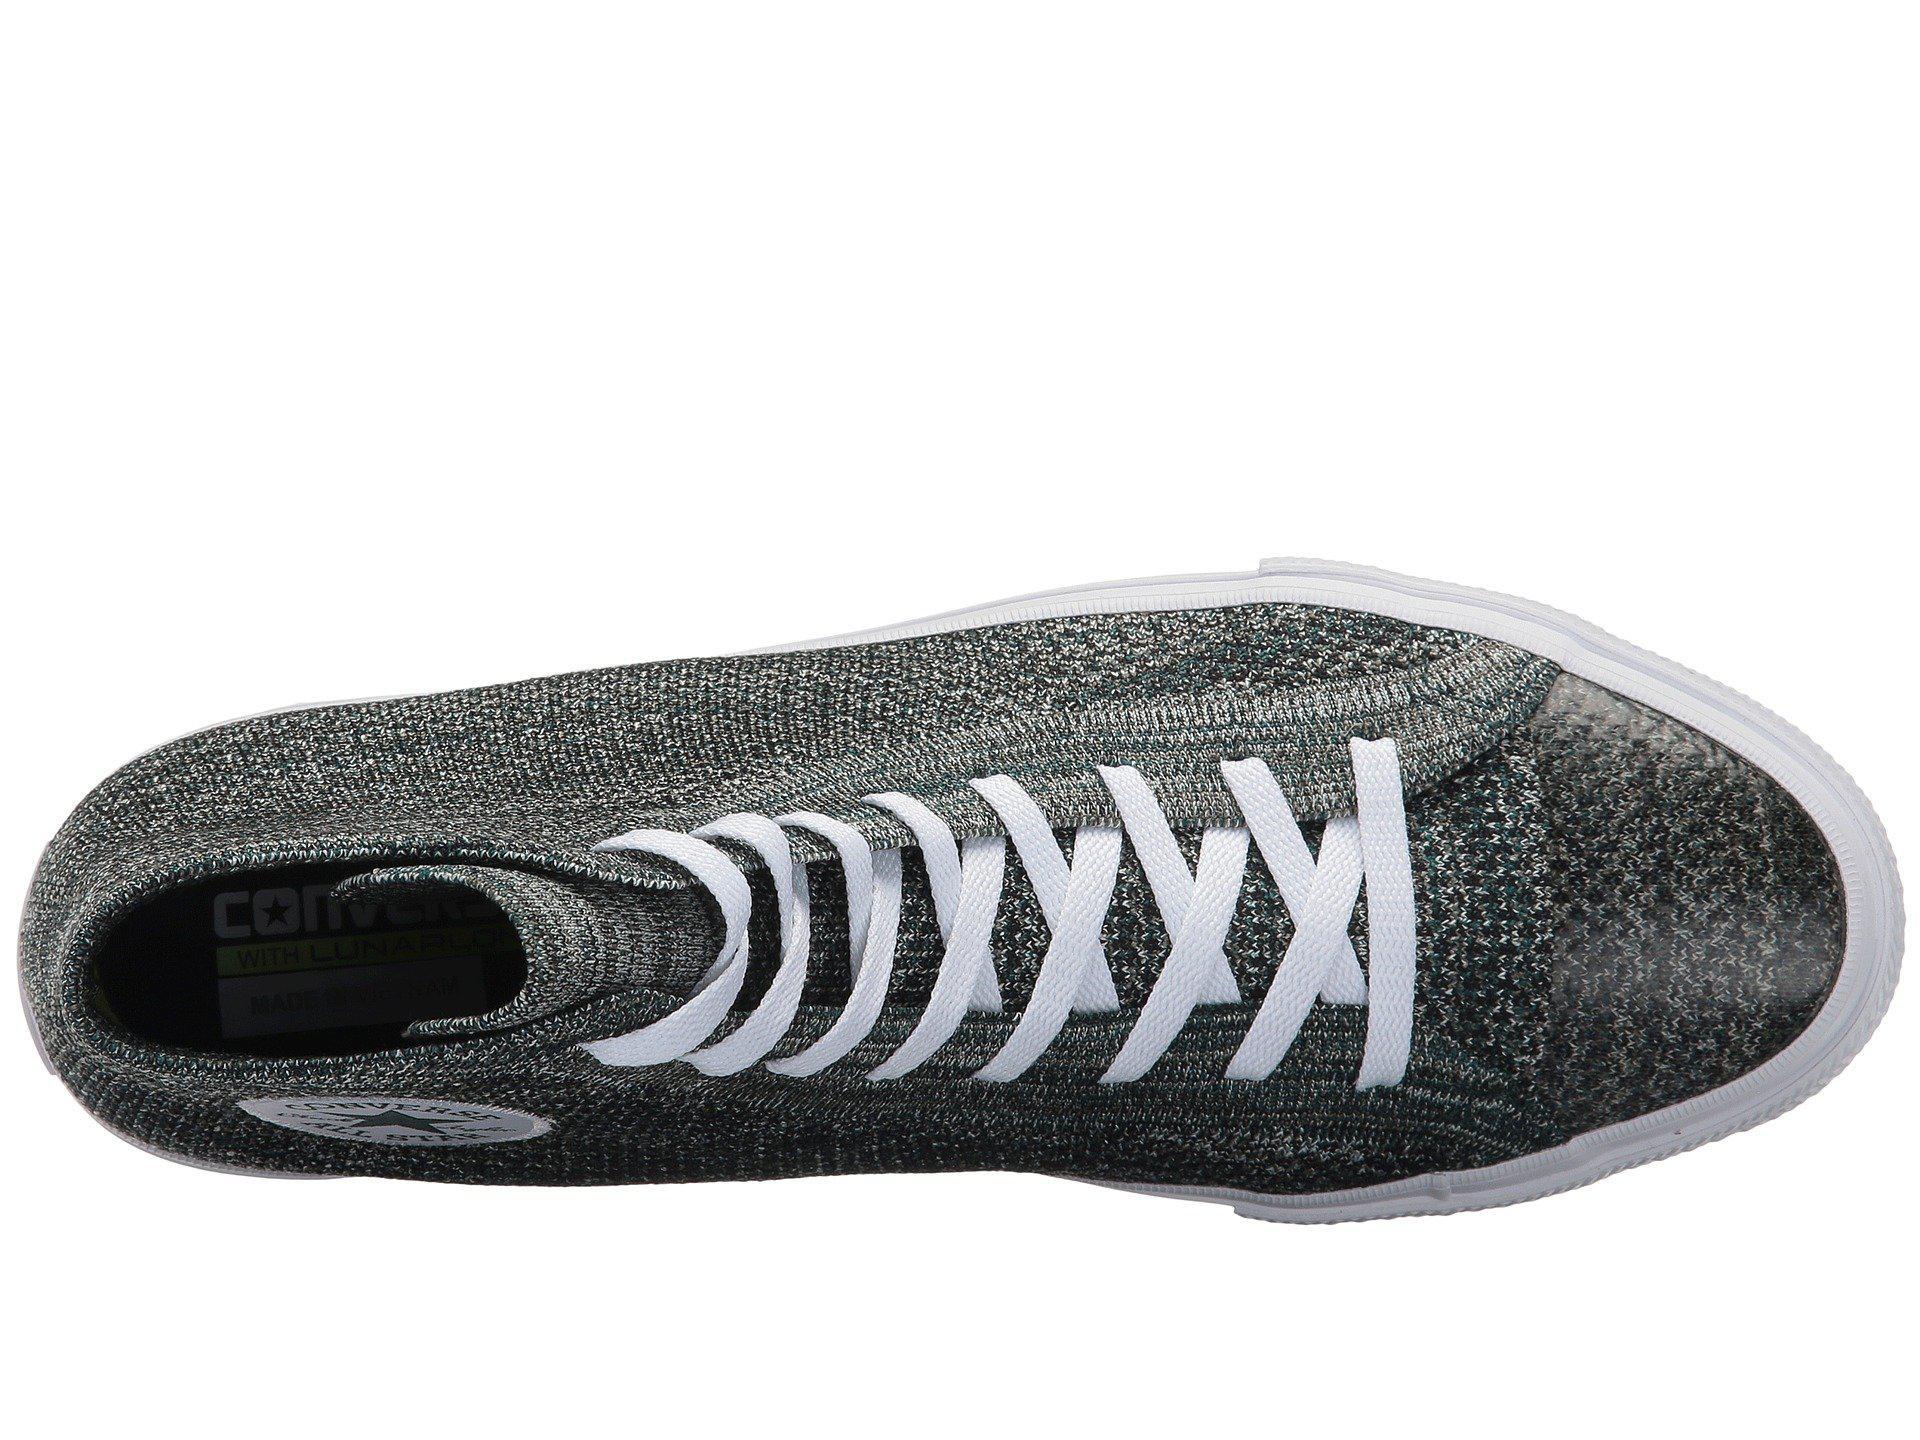 d19dd2439b62 Converse - Multicolor Chuck Taylor® All Star® X Nike Flyknit Hi - Lyst.  View fullscreen